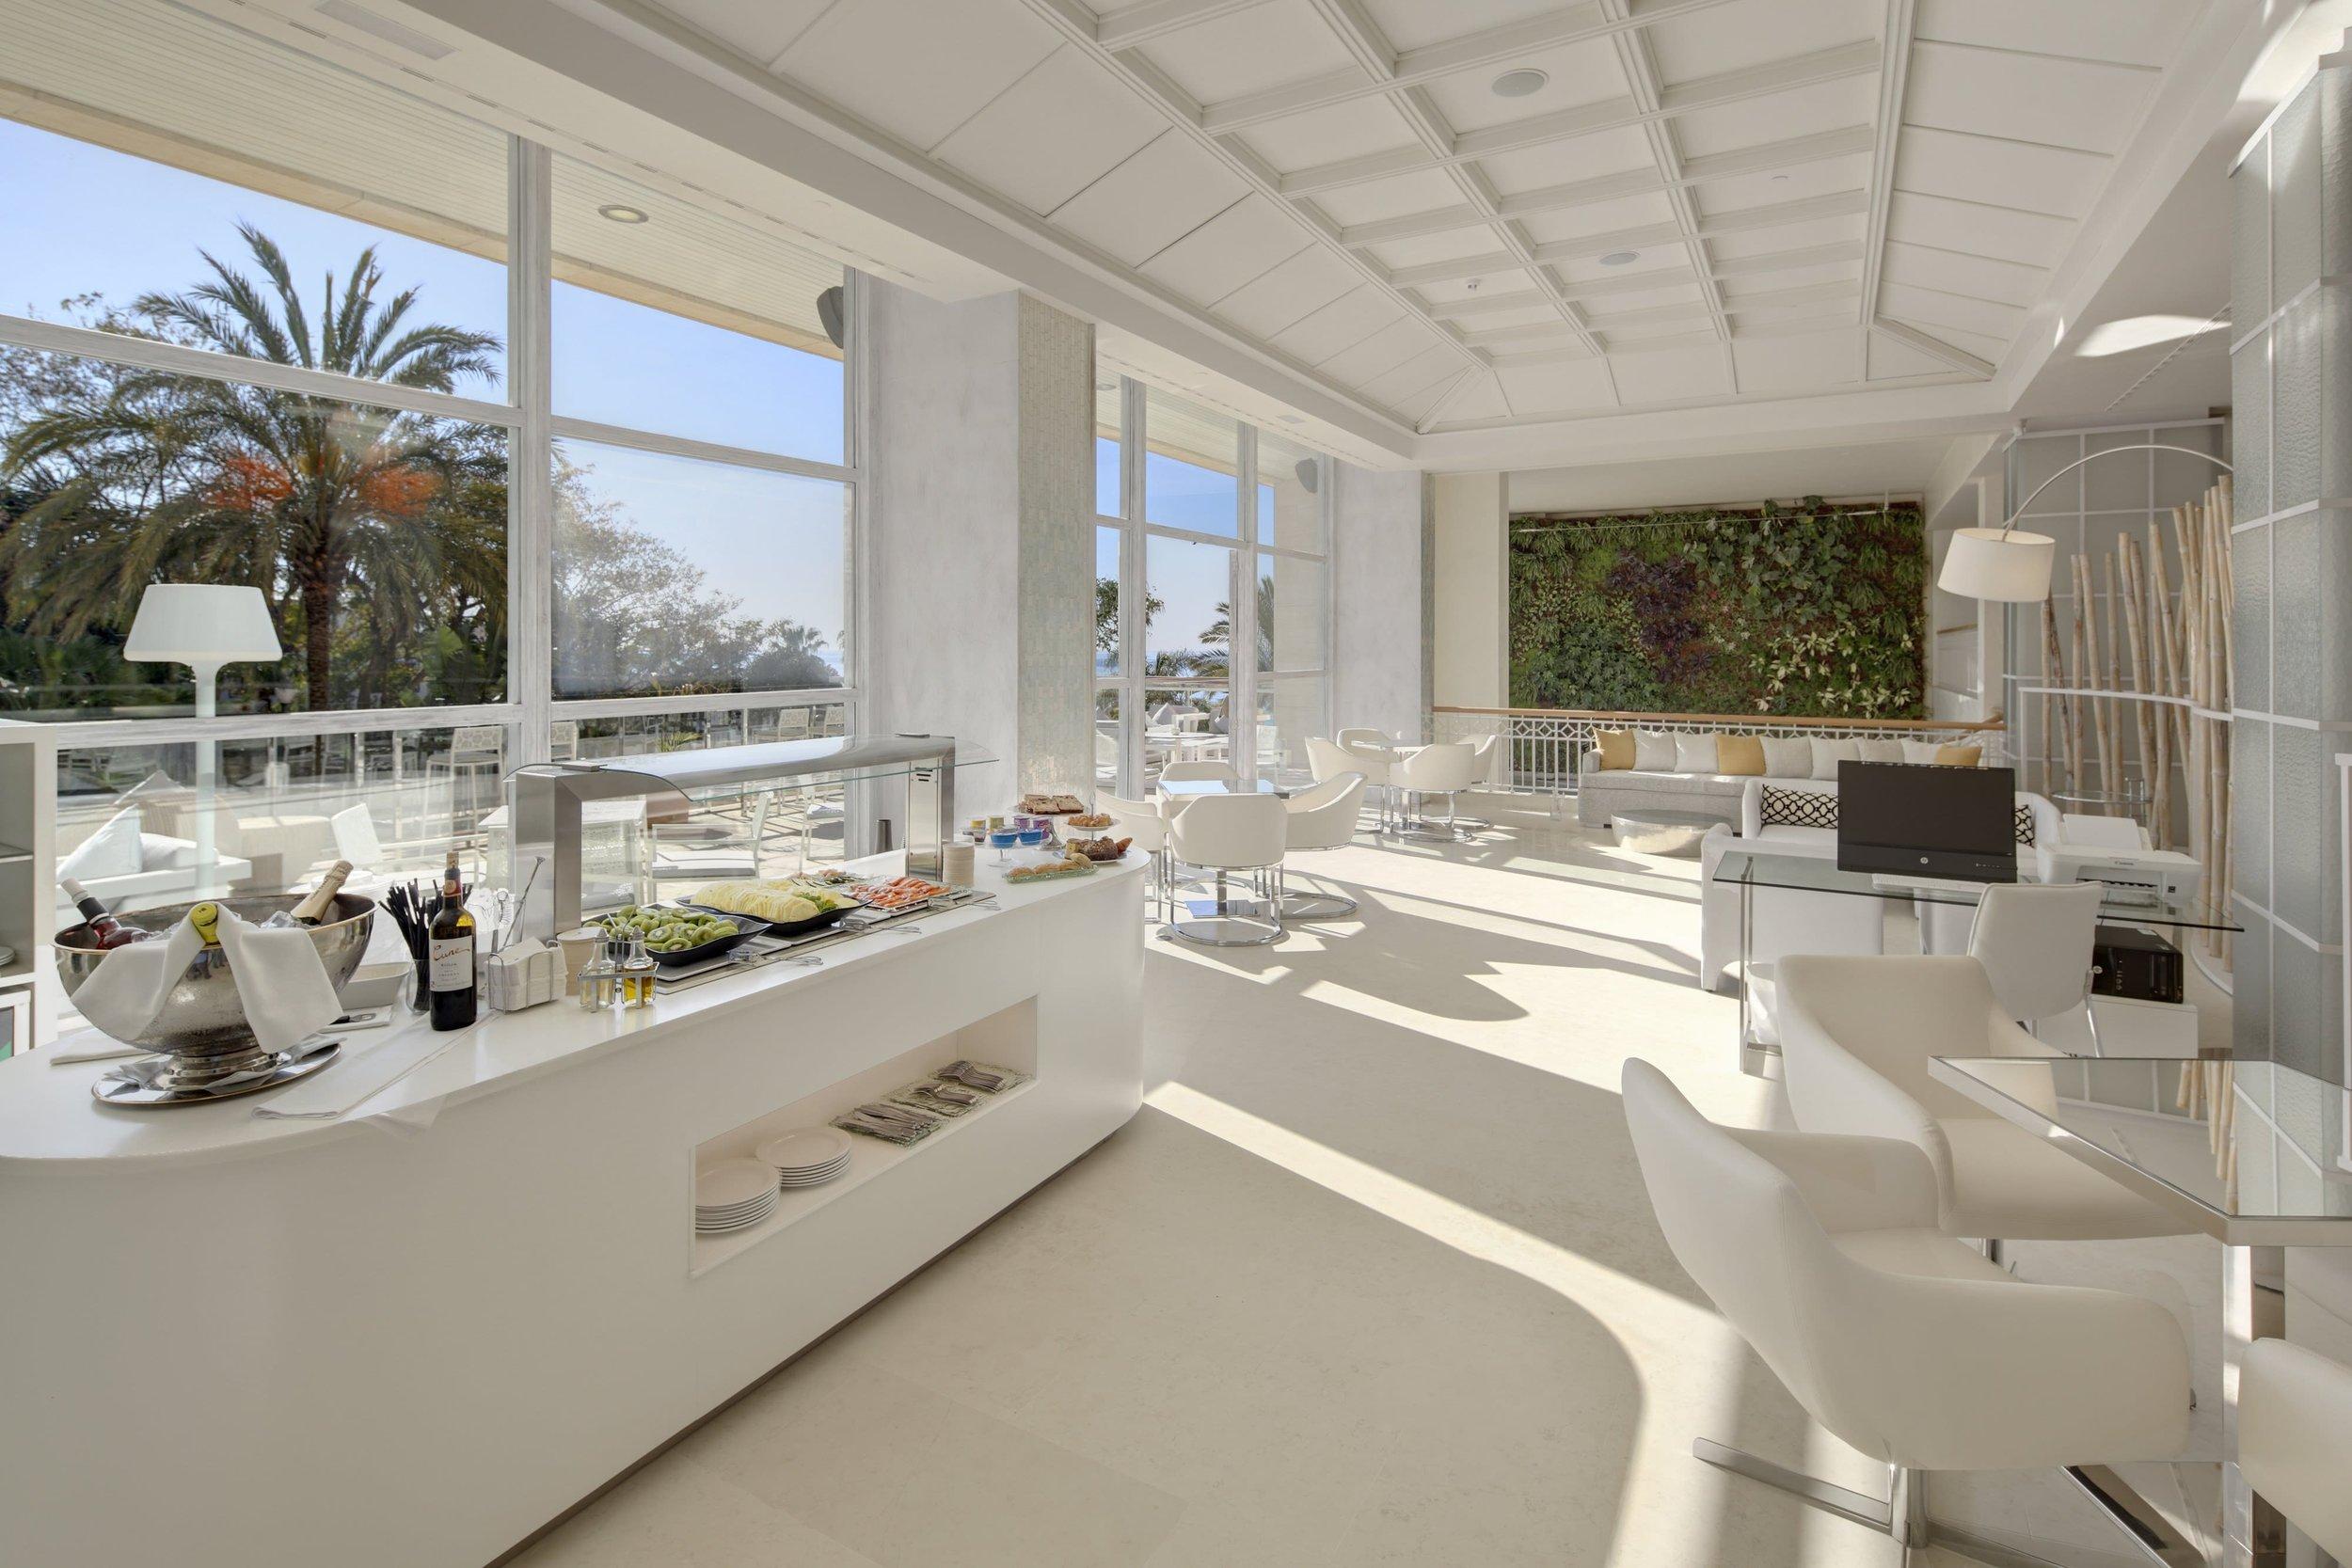 Amare Beach Hotel Marbella The One Lounge